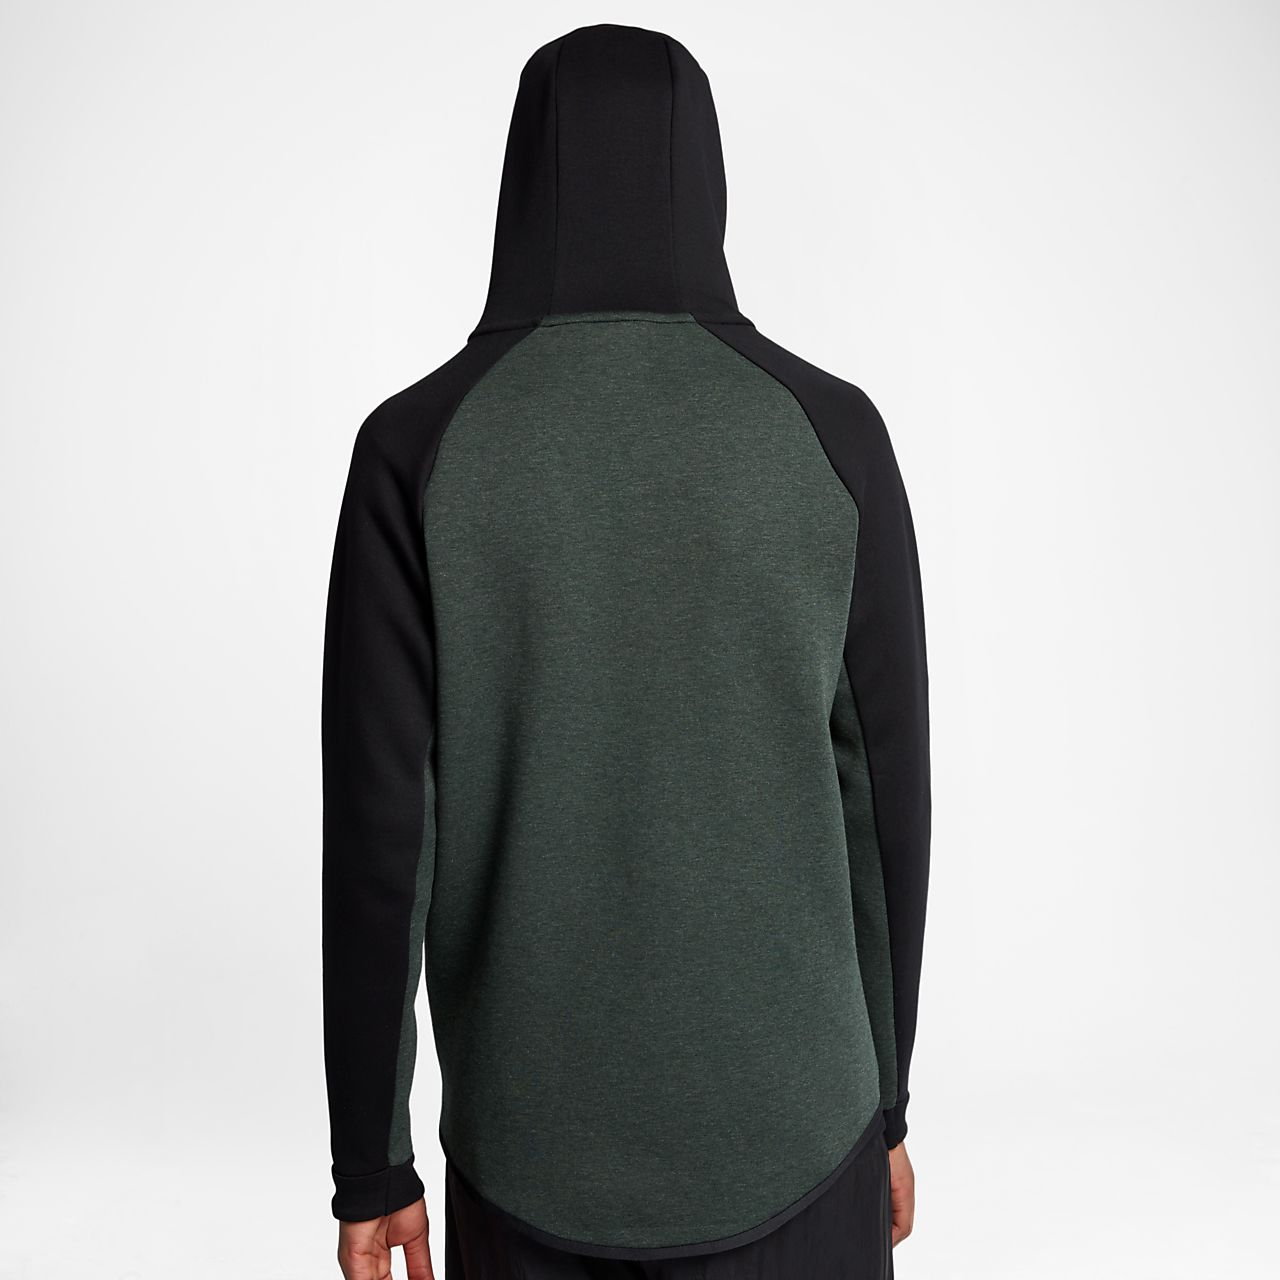 Nike tech fleece windrunner mens hoodie, Men's Fashion